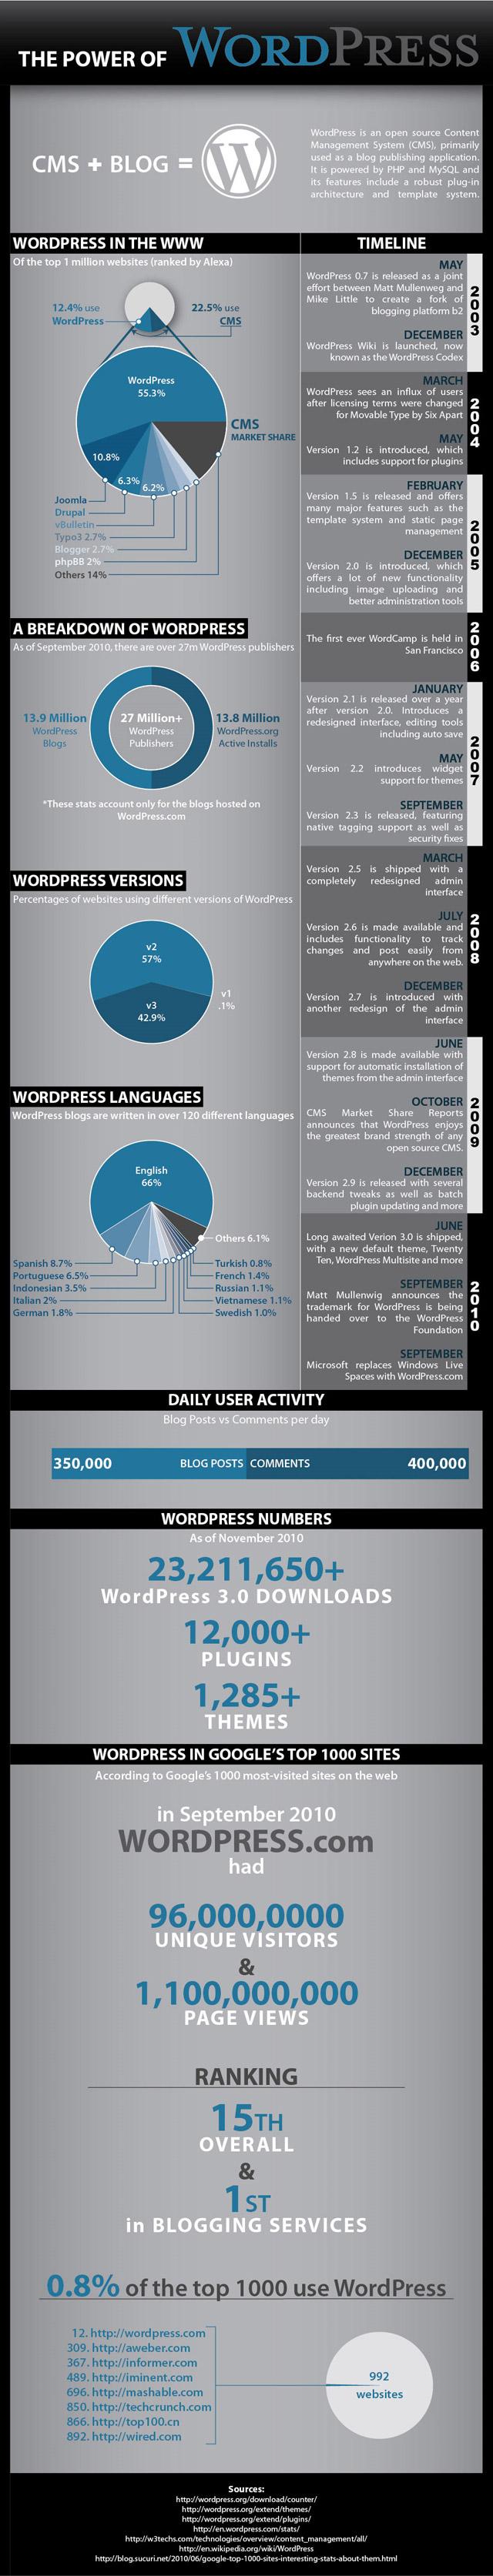 infographie wordpress évolution puissance